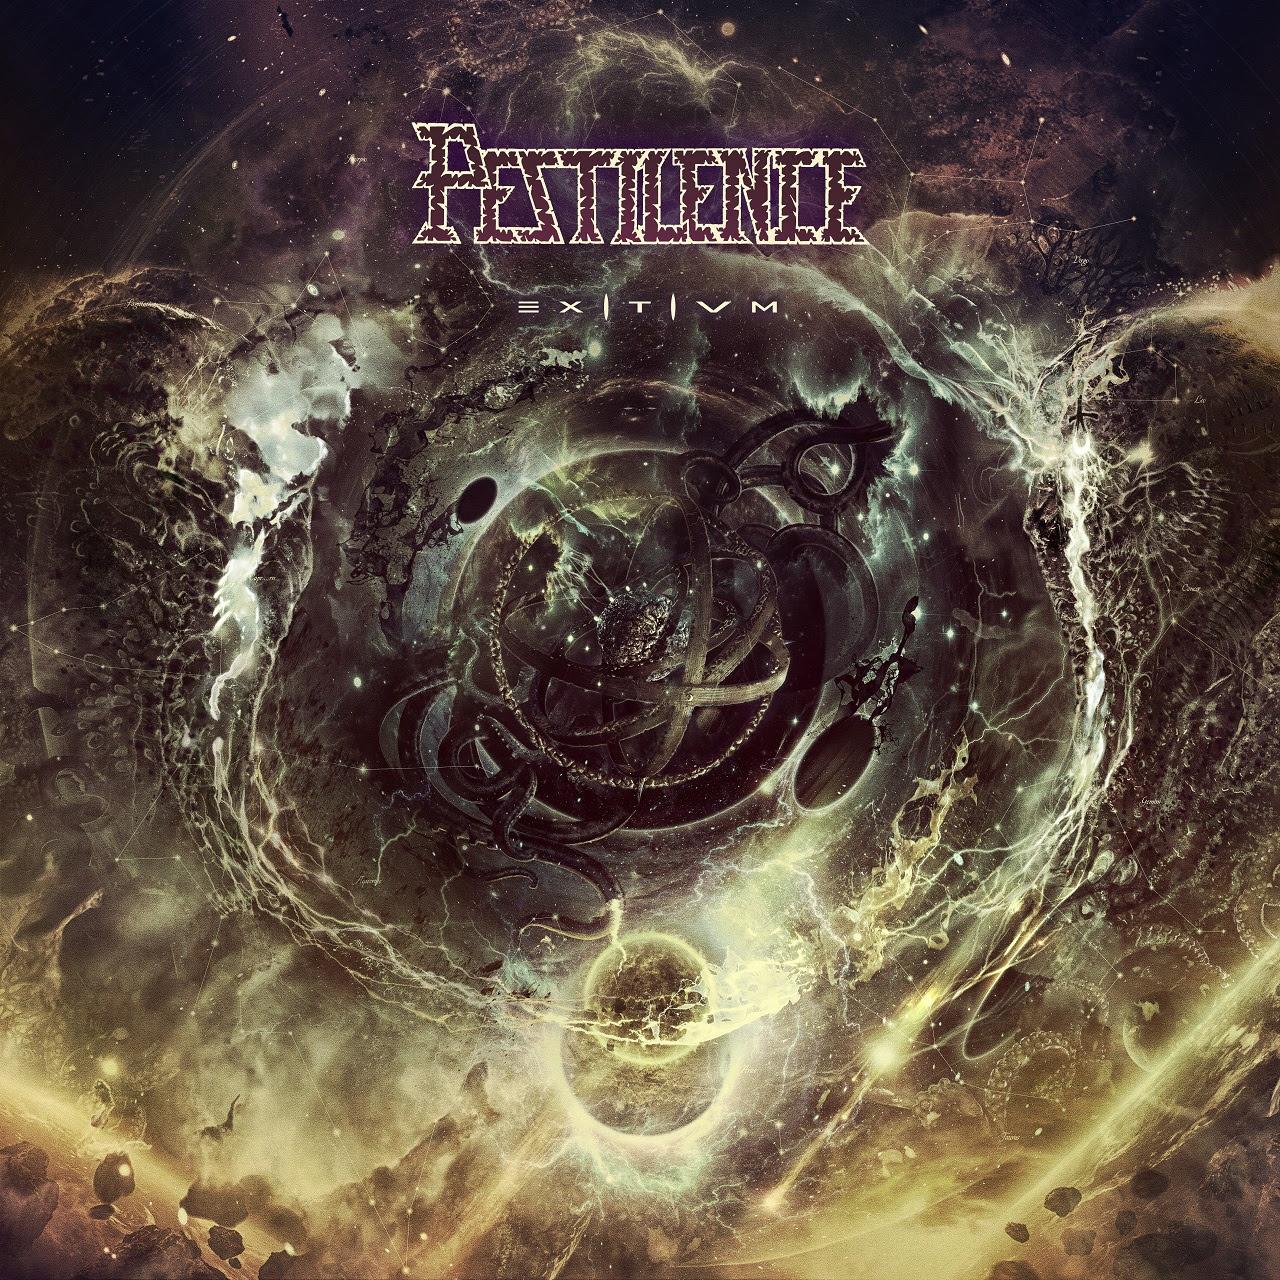 PESTILENCE Reveals Details of New Album 'Exitivm' – R o c k 'N' L o a d